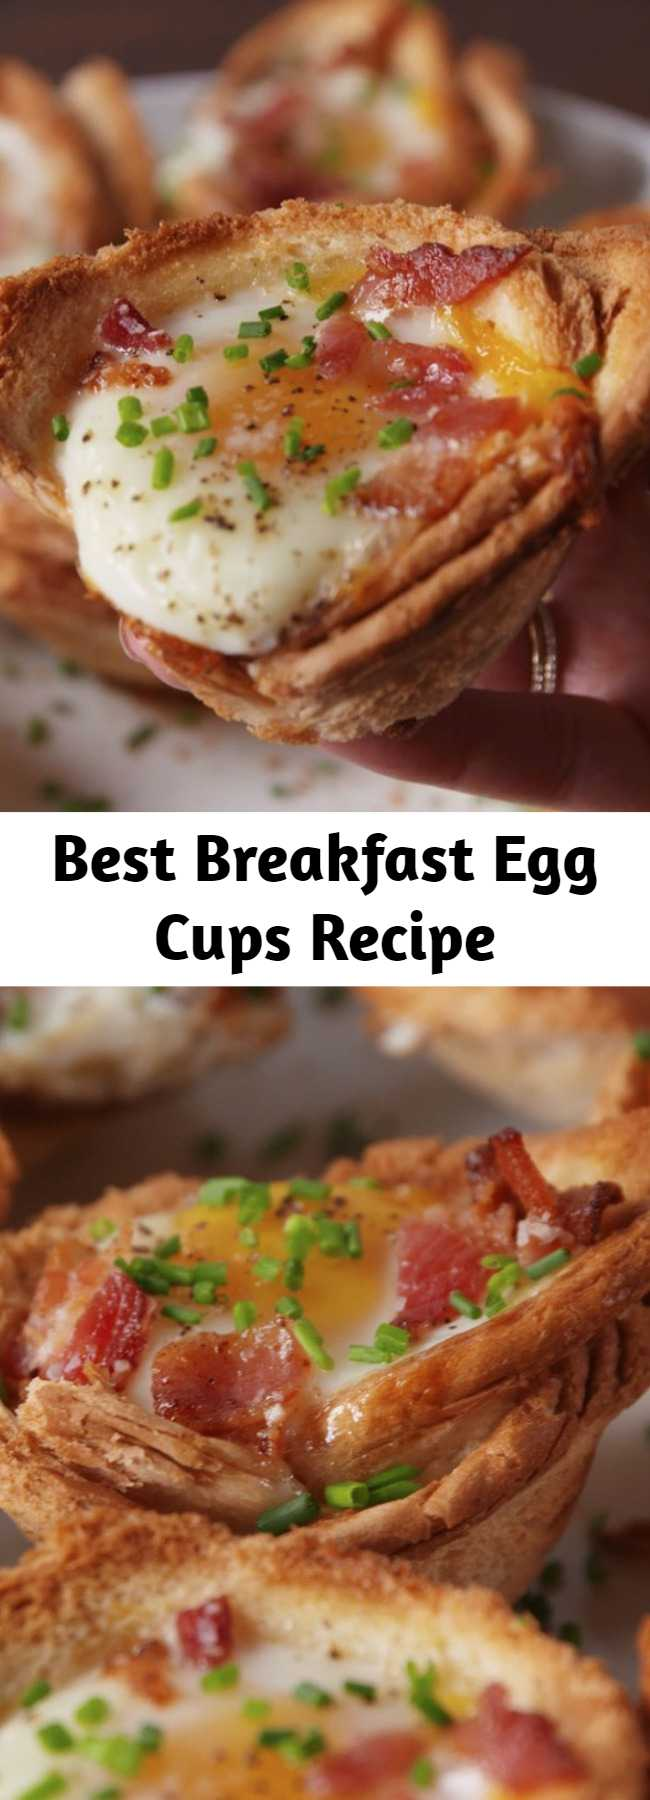 Best Breakfast Egg Cups Recipe - This Breakfast Egg Cups Recipe is the perfect breakfast on-the-go. #food #breakfast #eggs #brunch #easyrecipe